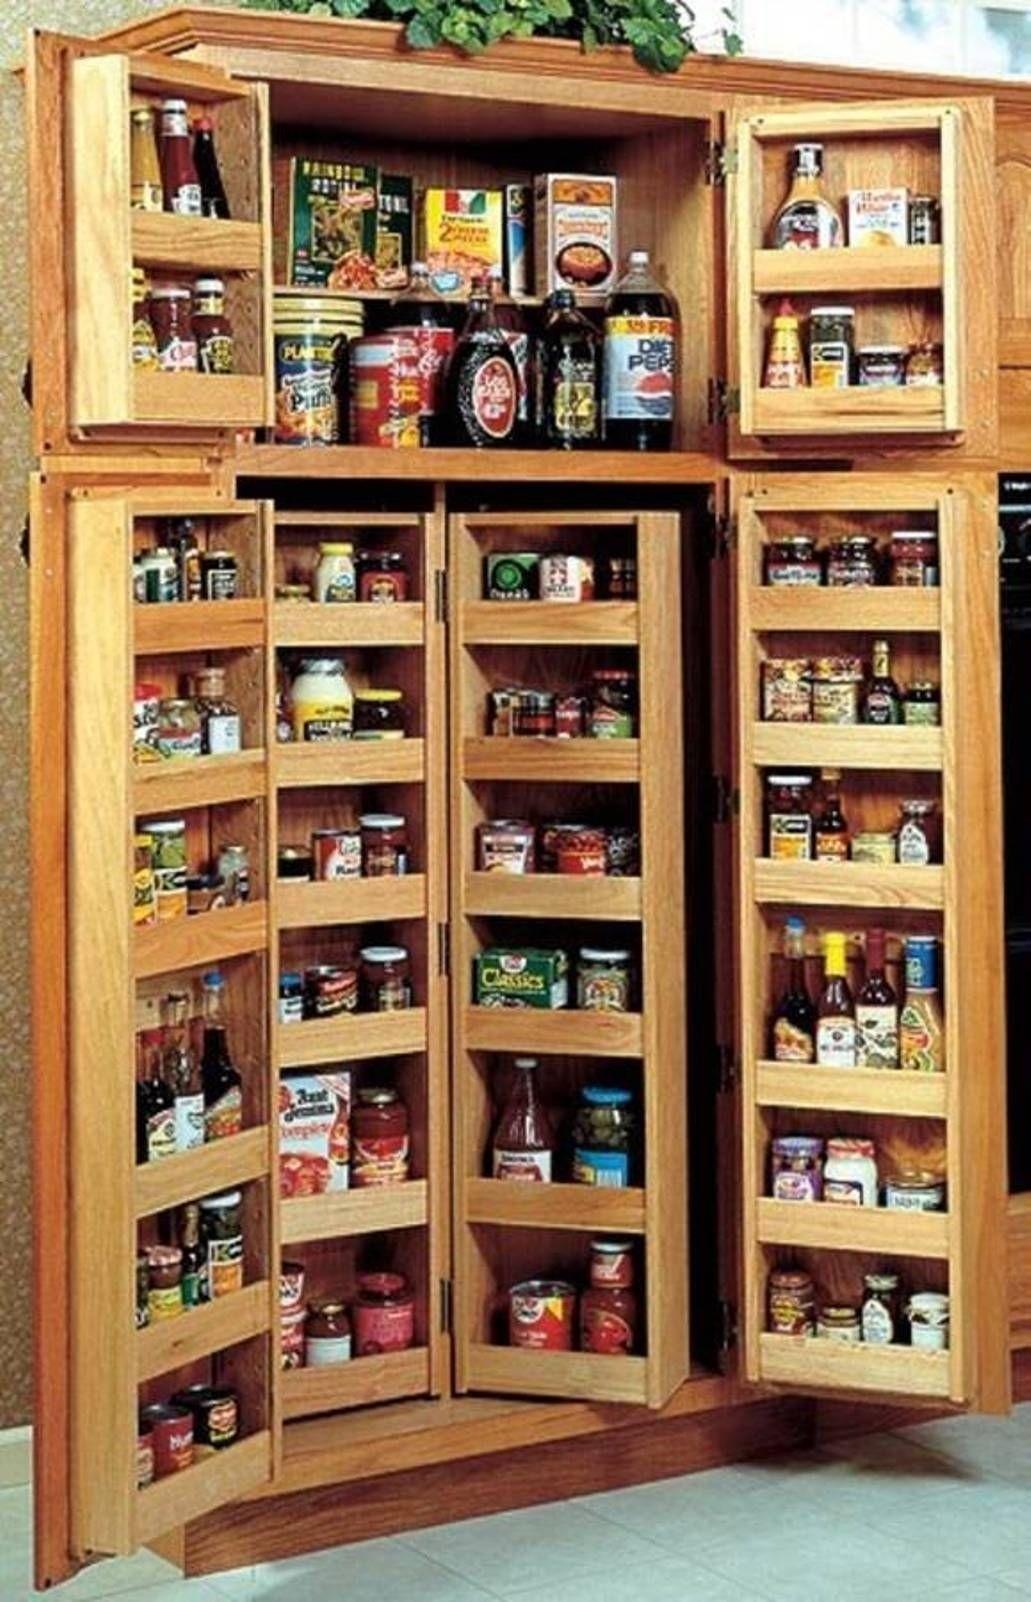 Oak pantry storage cabinet 4 & Oak Pantry Storage Cabinet - Foter